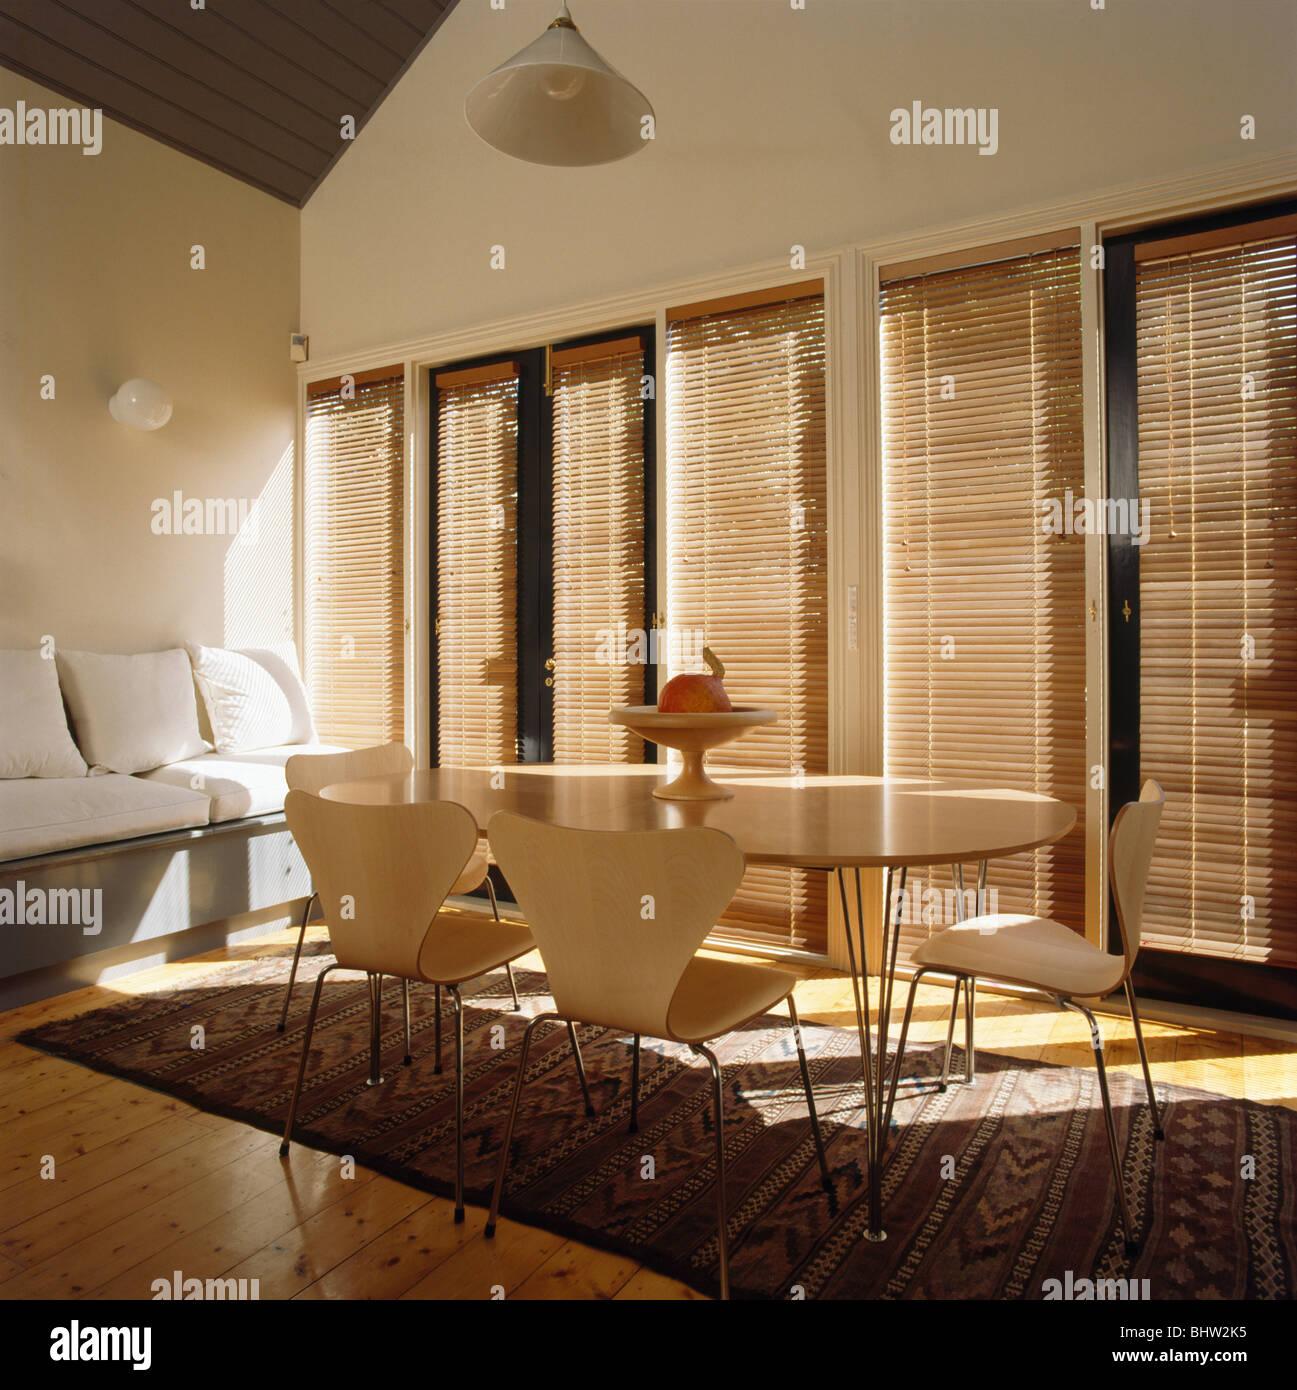 Ant D Arne Jacobsen Chaises Table De Salle à Manger Moderne